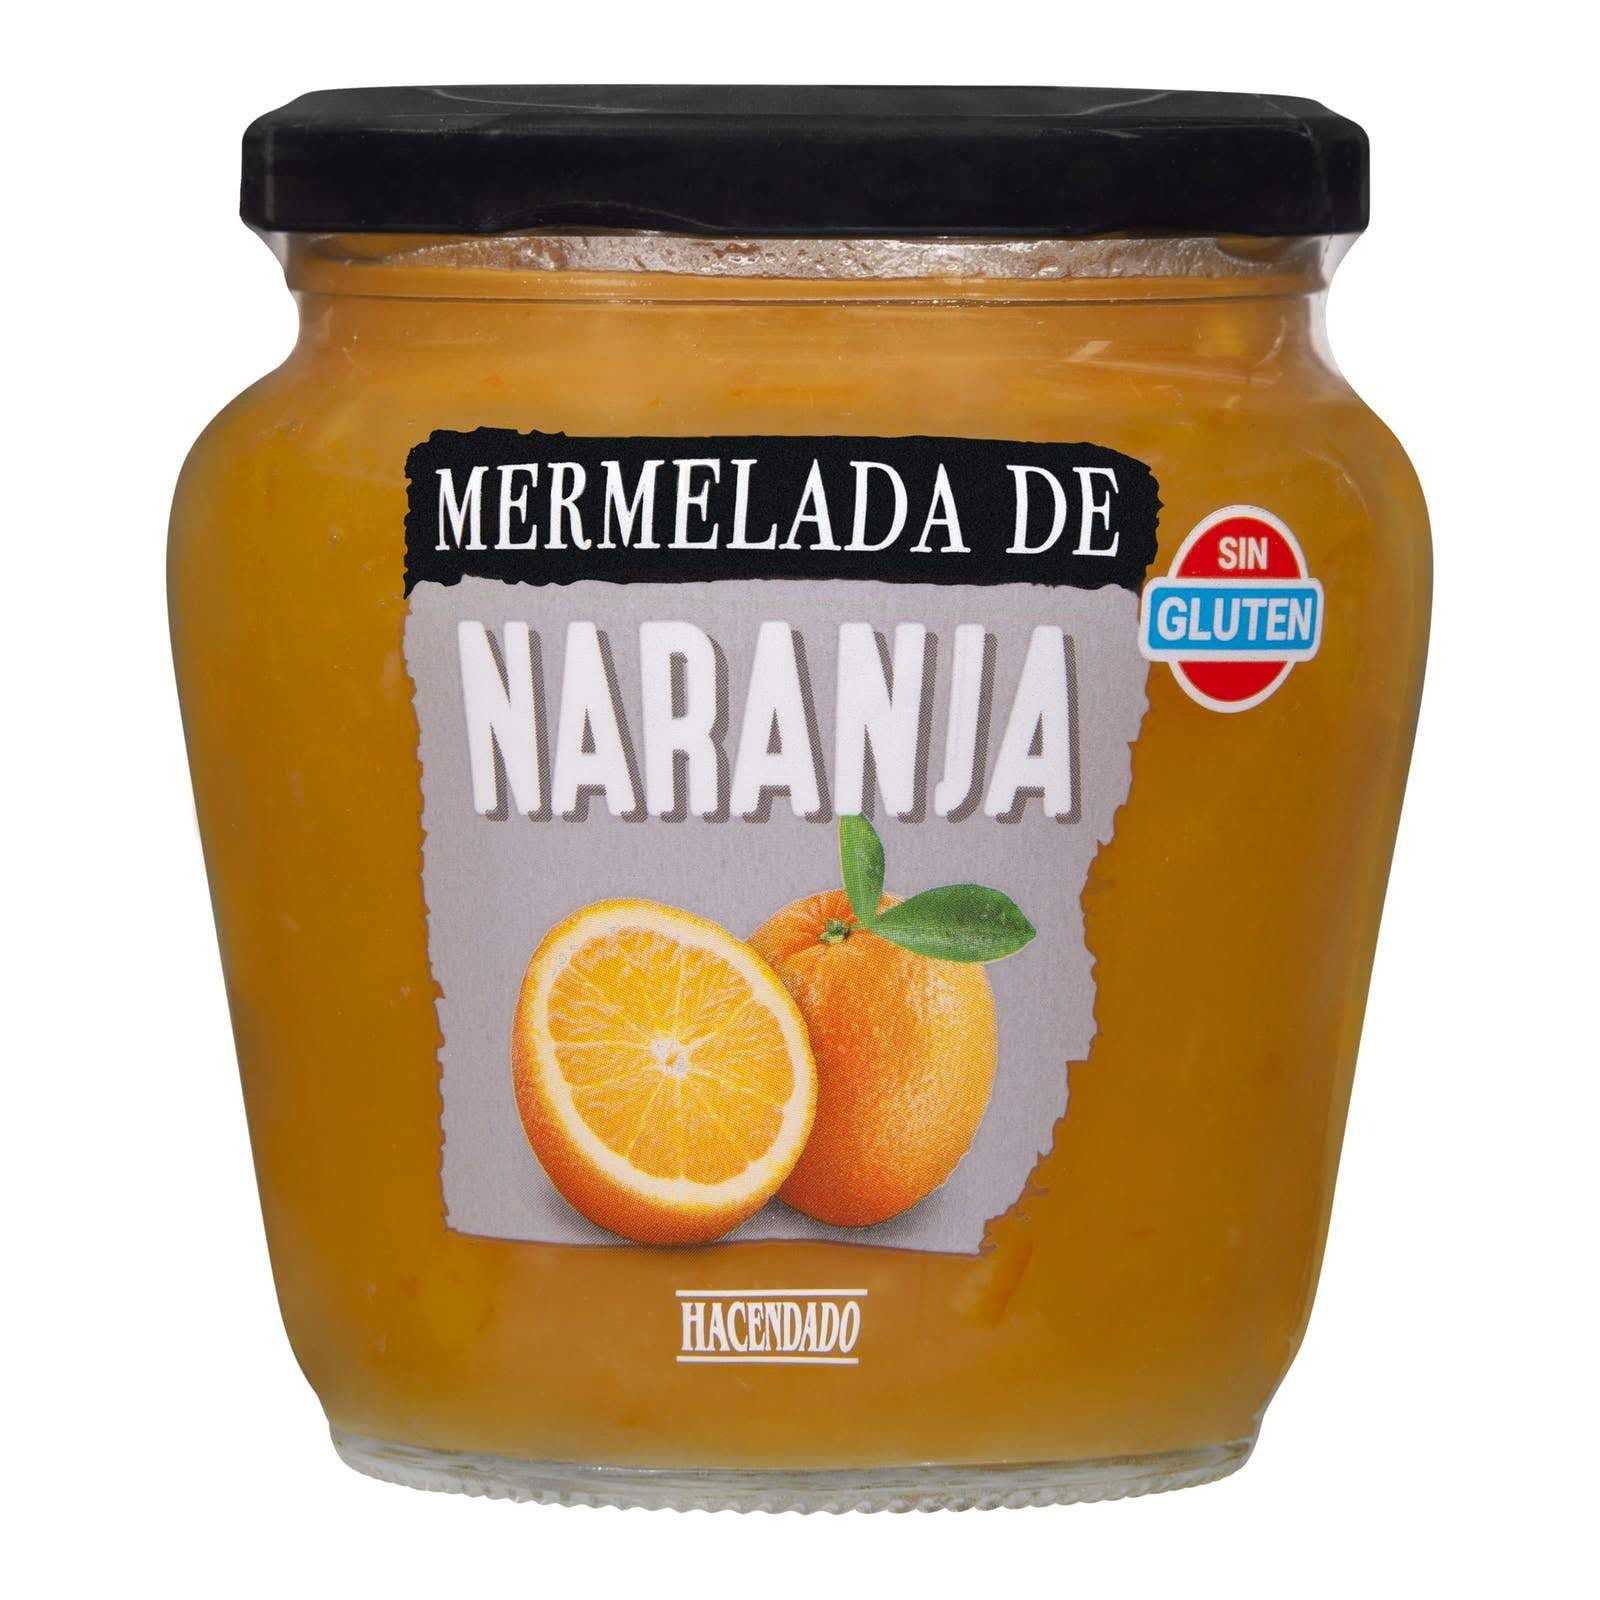 Mermelada de naranja Hacendado